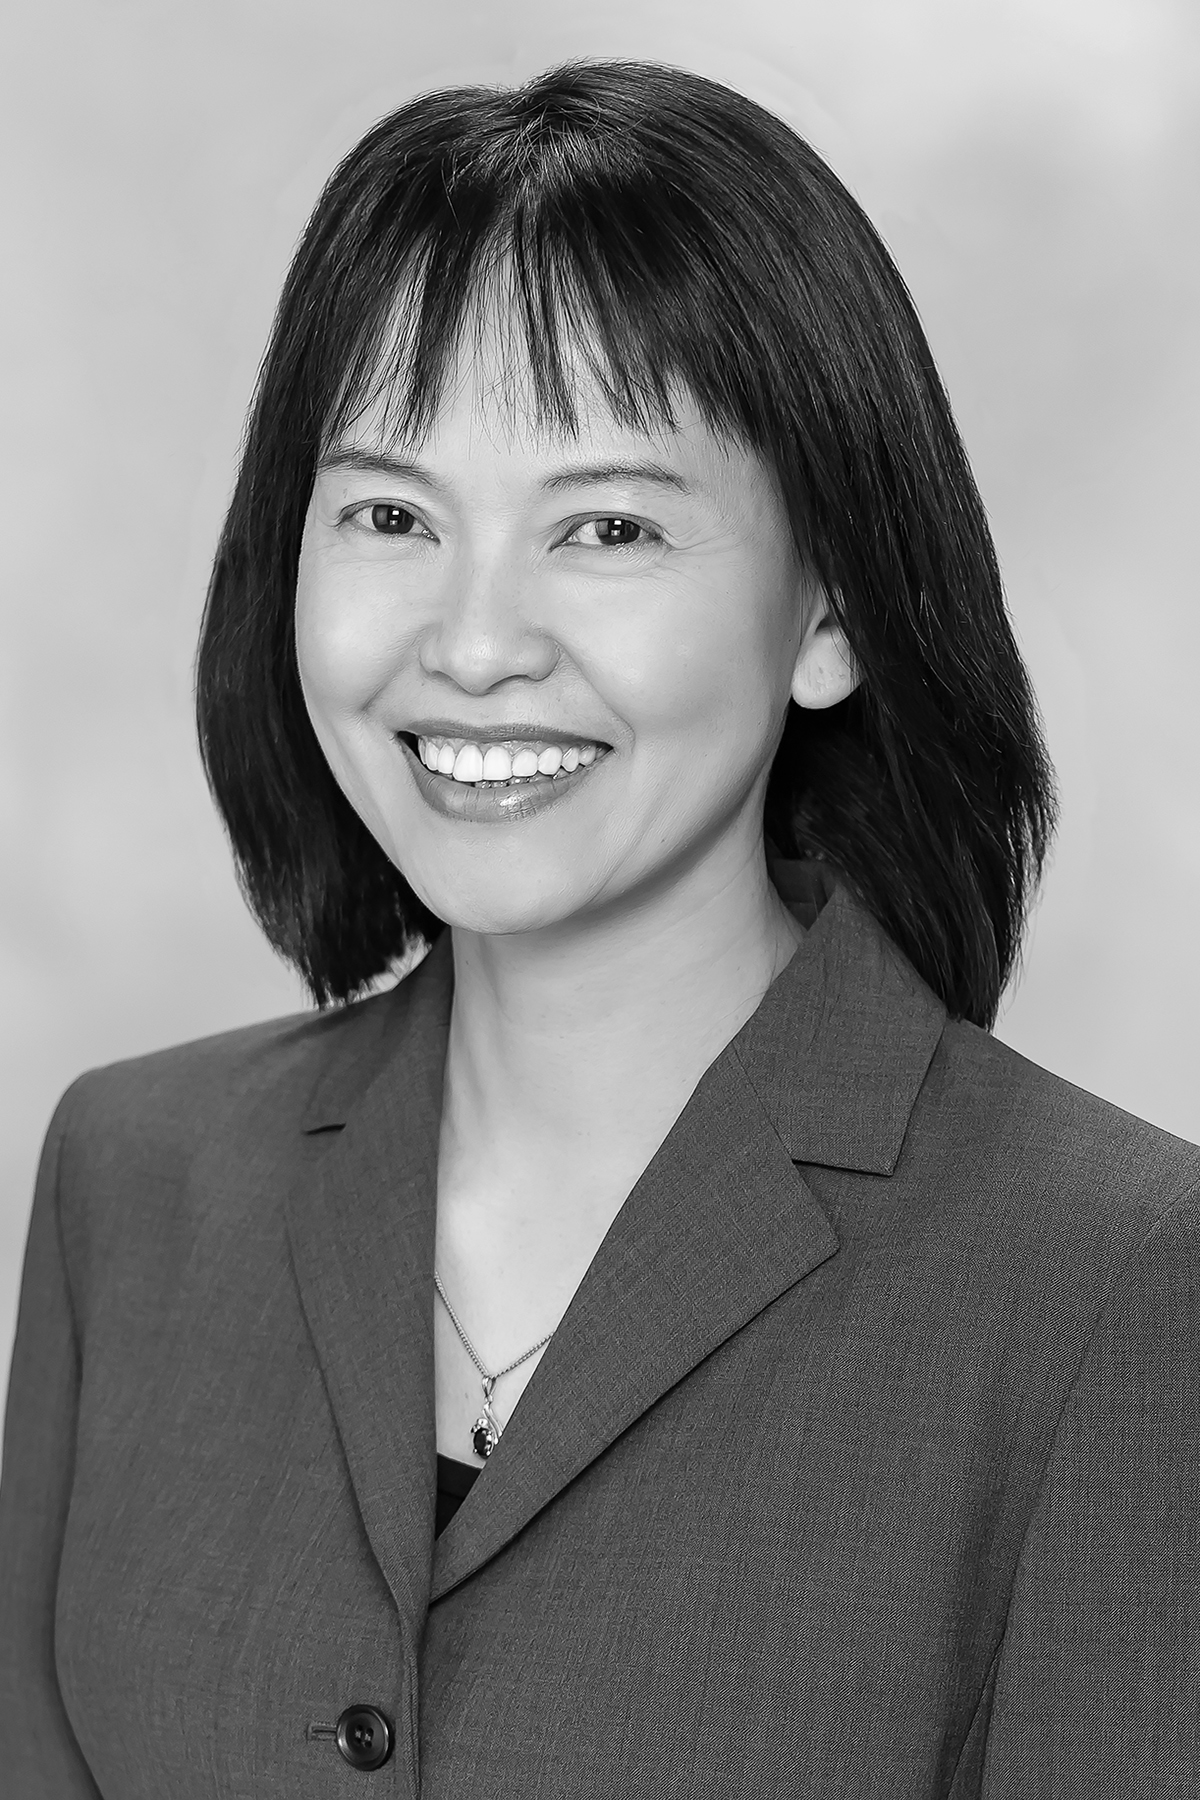 Jessica Feng